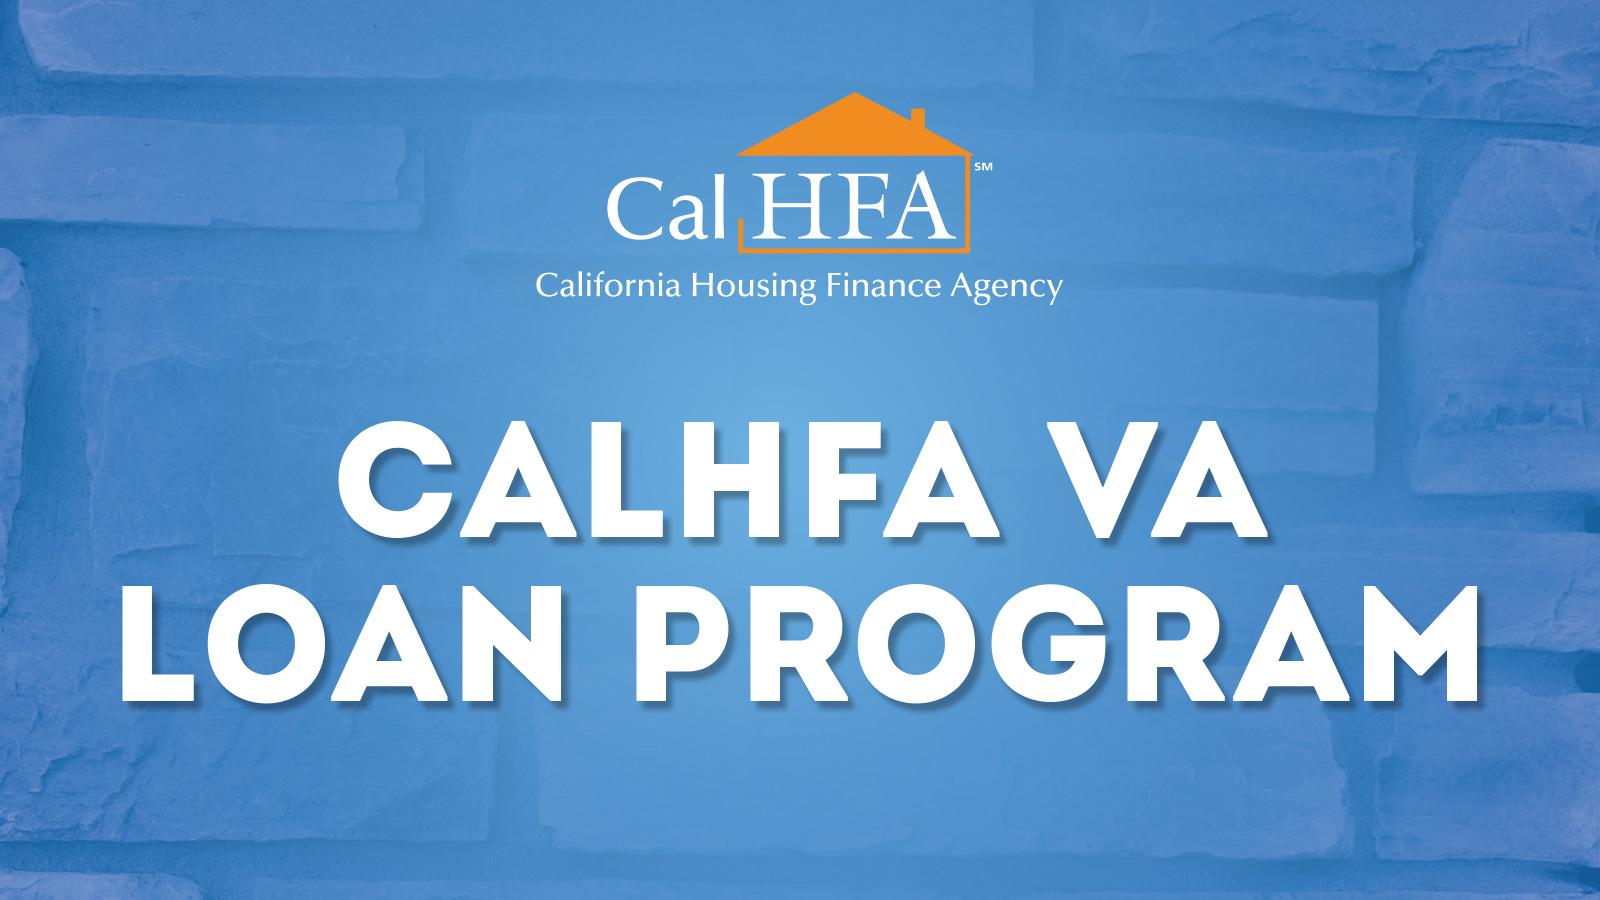 First Time Home Loans Calhfa Va Program